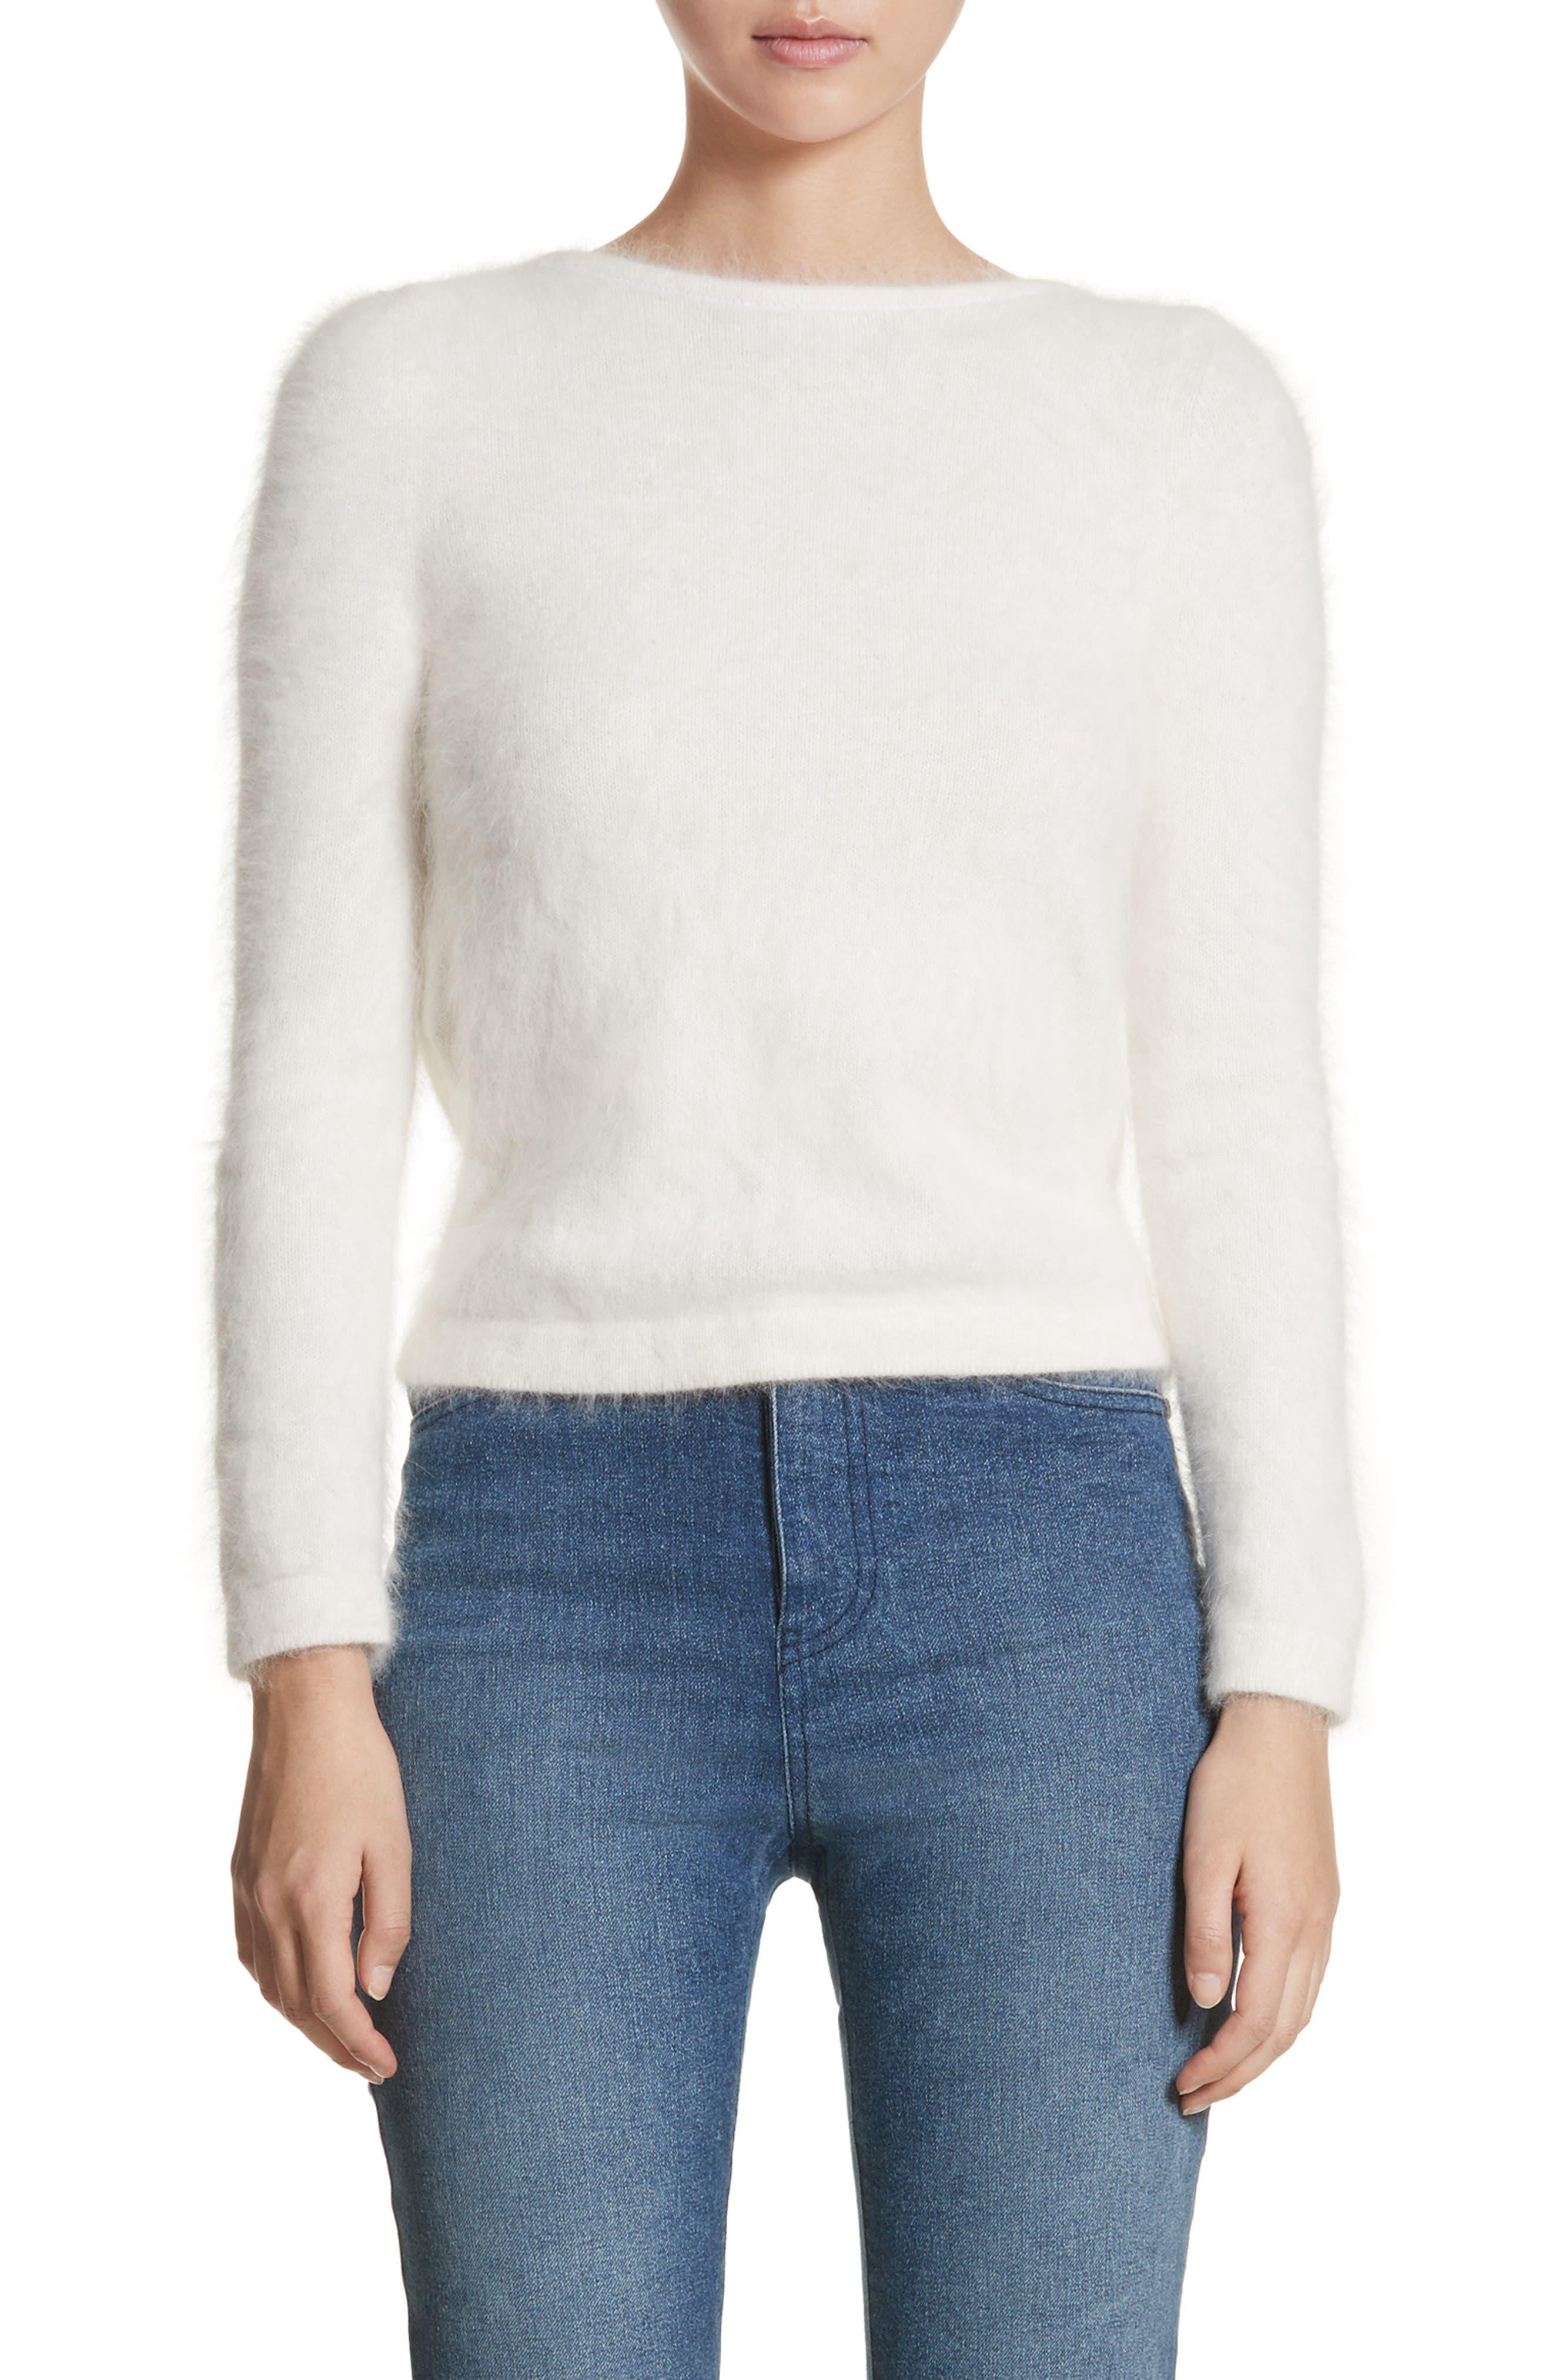 Alternate Image 1 Selected - Brandon Maxwell Drape Back Angora Blend Sweater